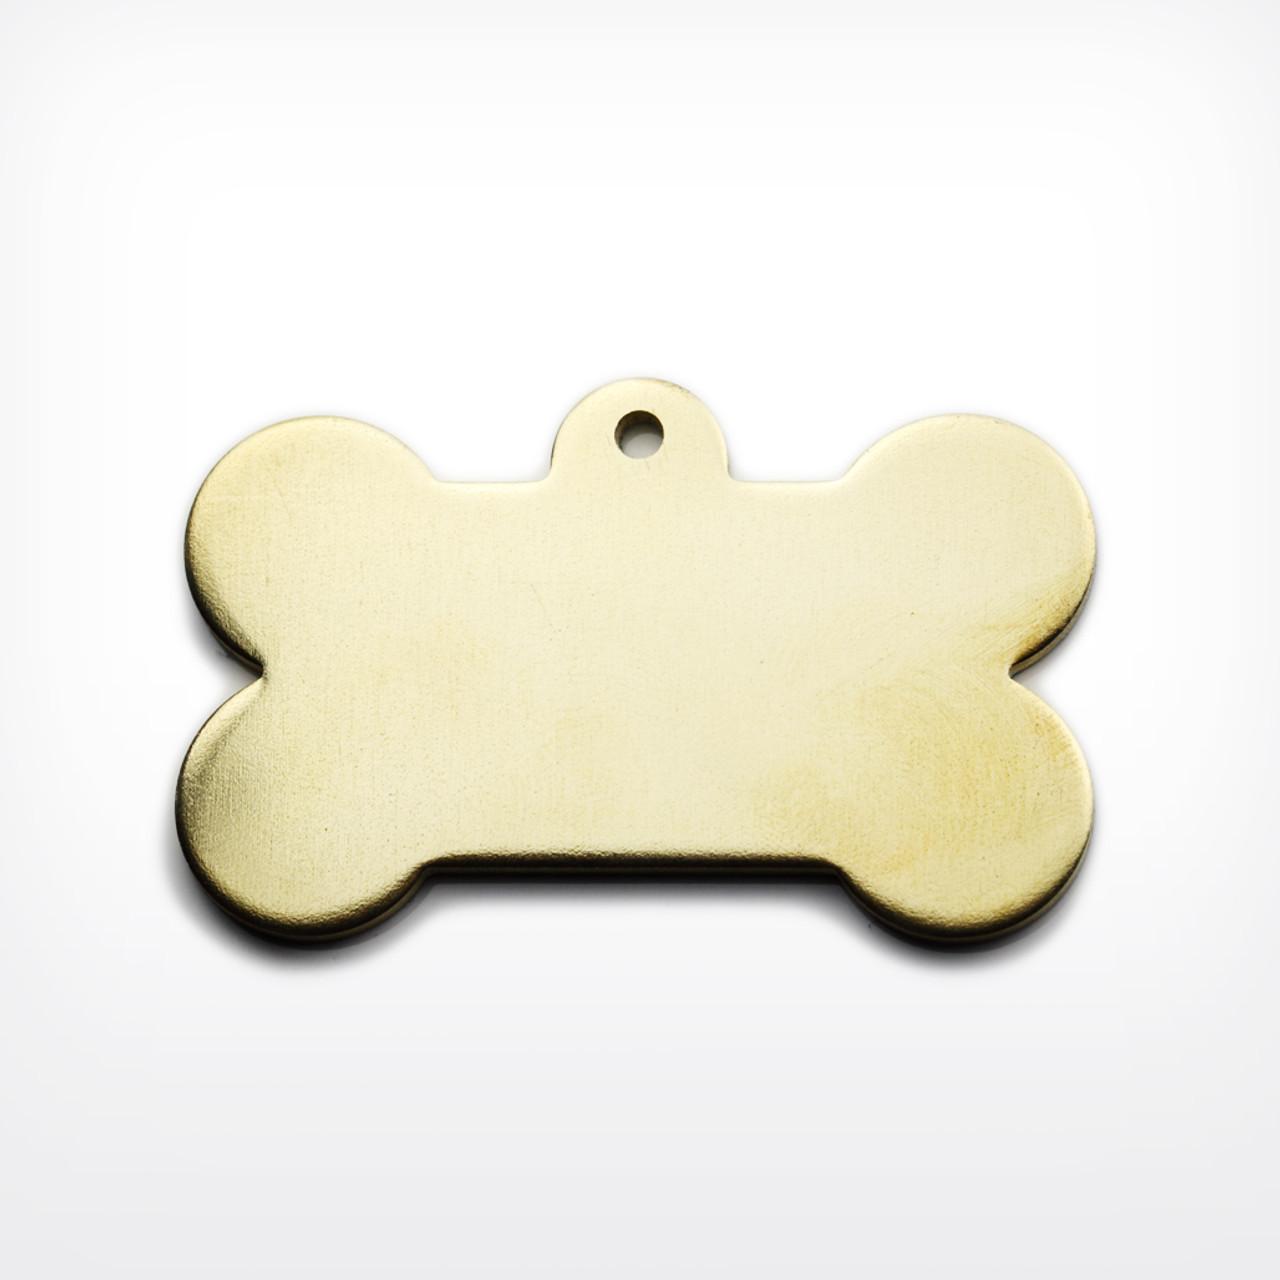 Brass Dog Bone, heavy gauge - Pack of 10 (490-BR)